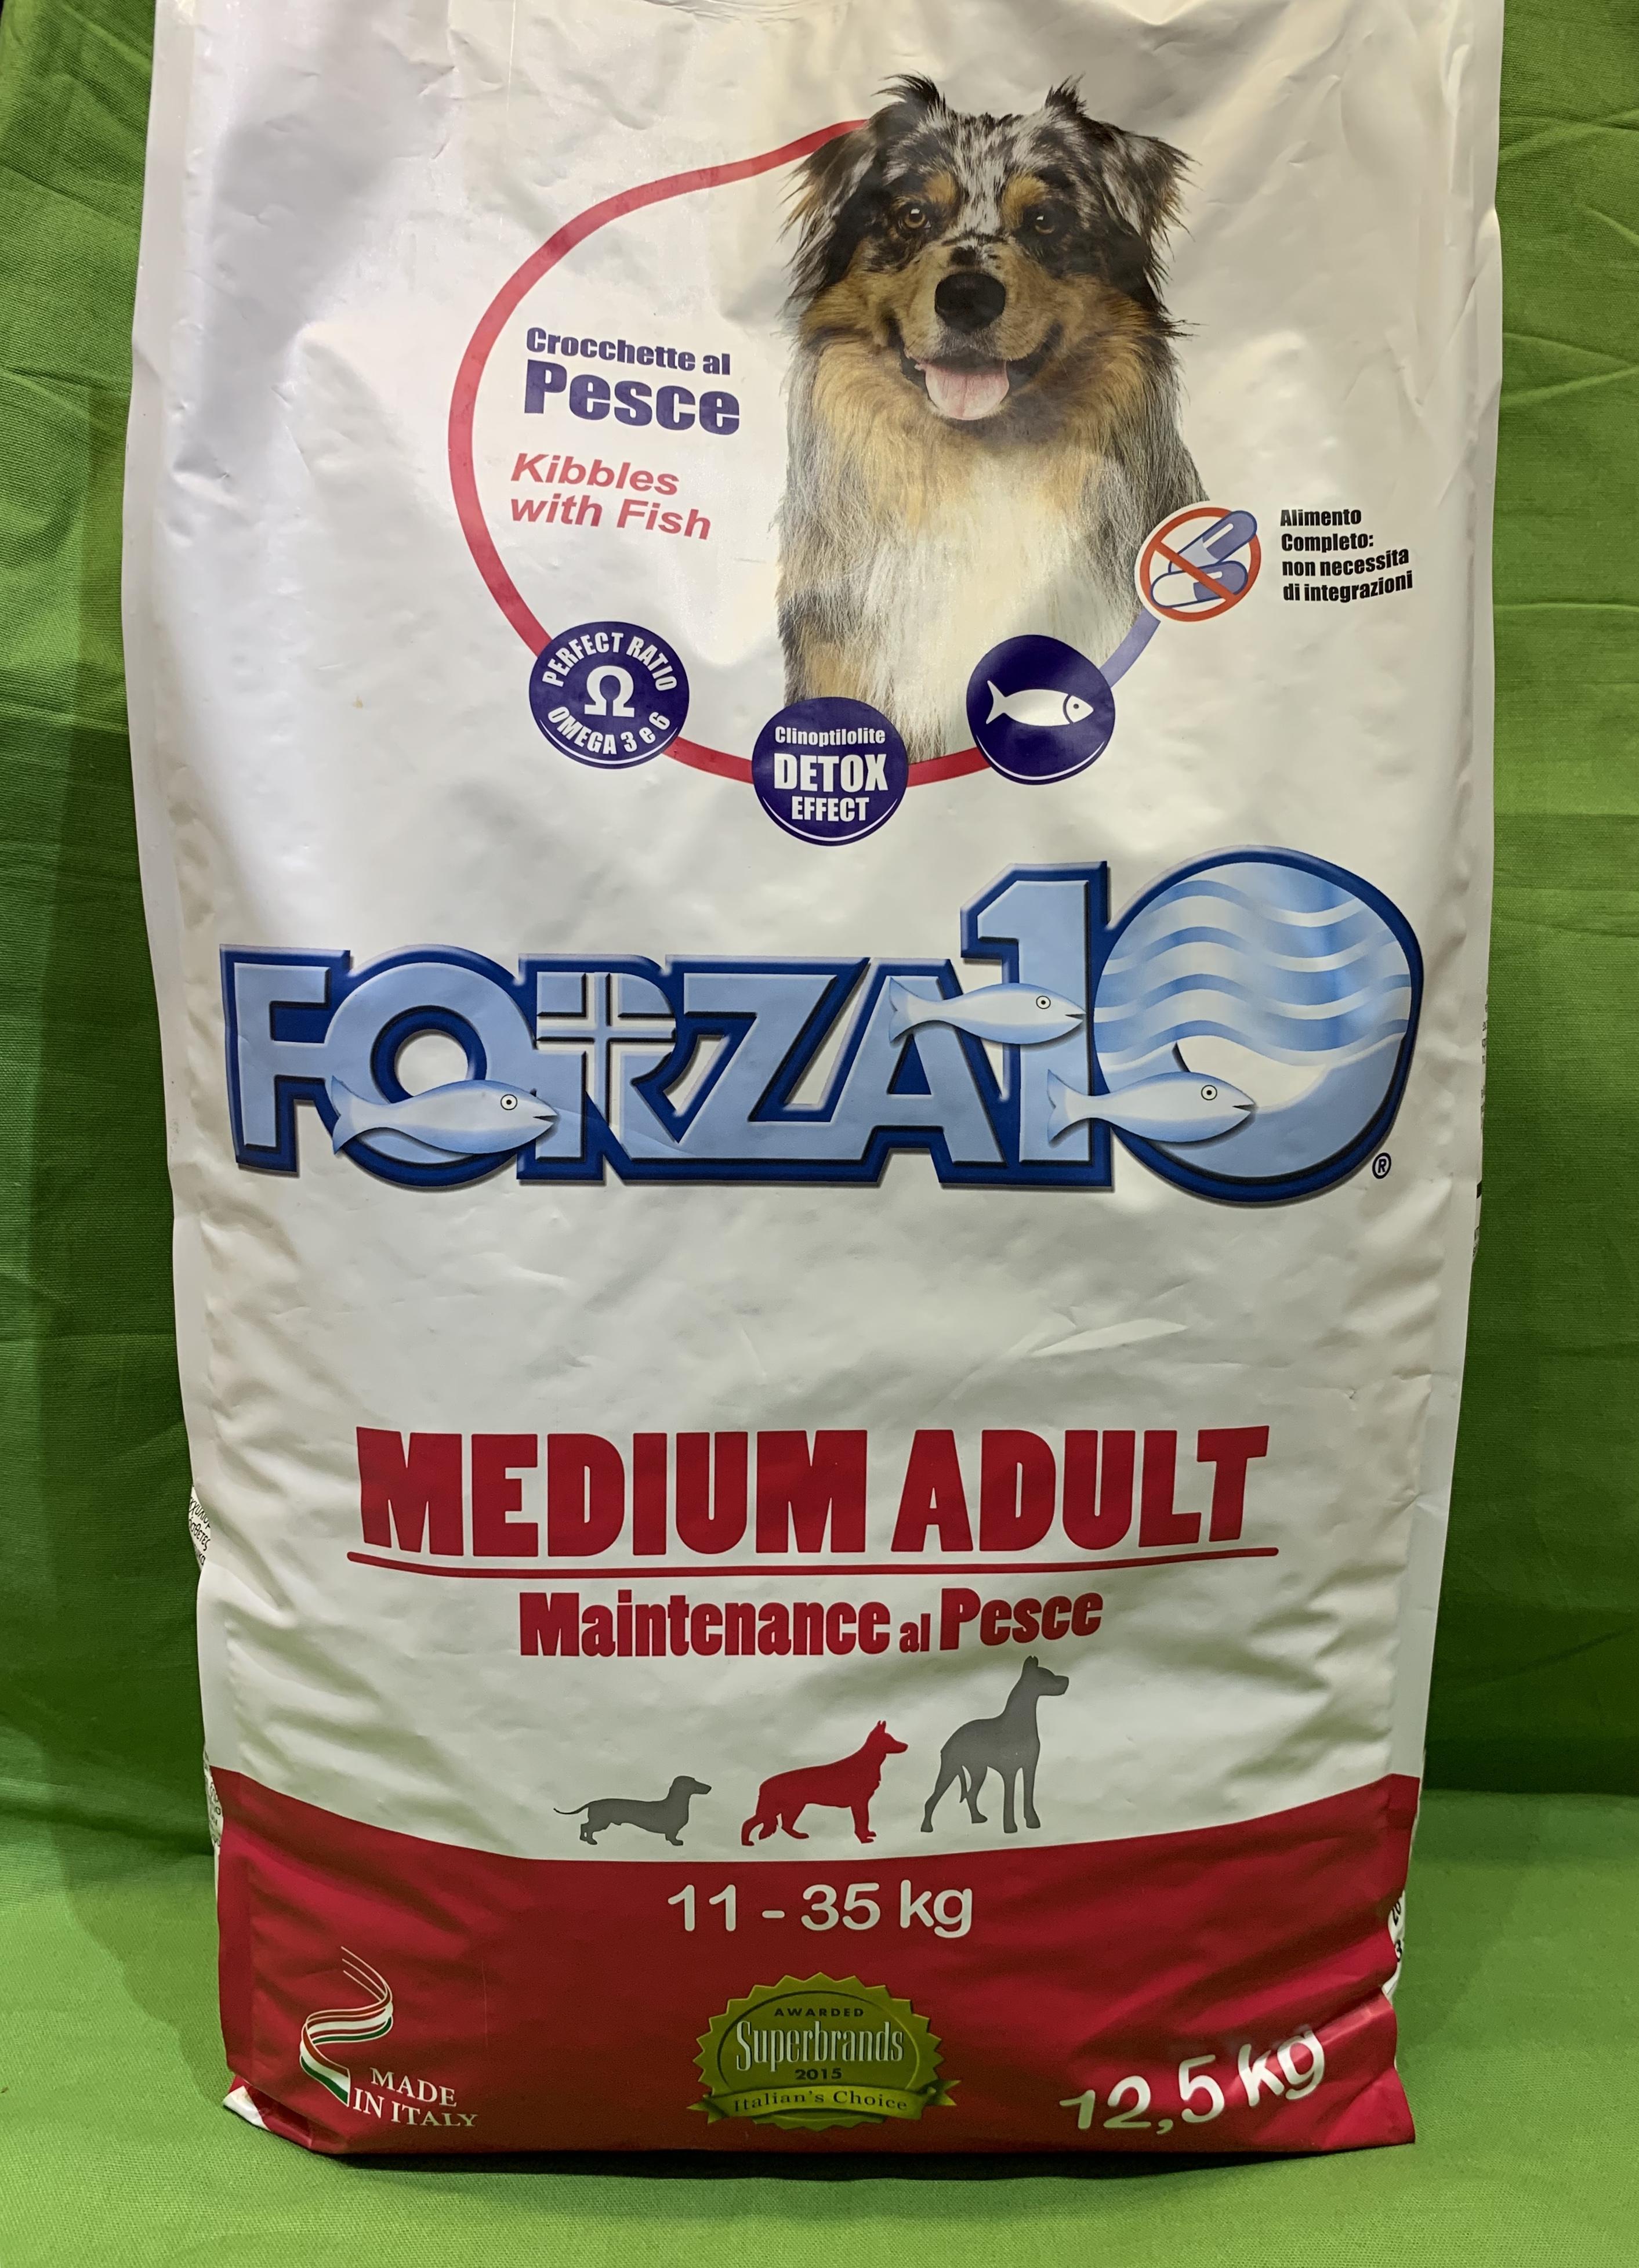 FORZA 10 MEDIUM ADULT 12.5kg